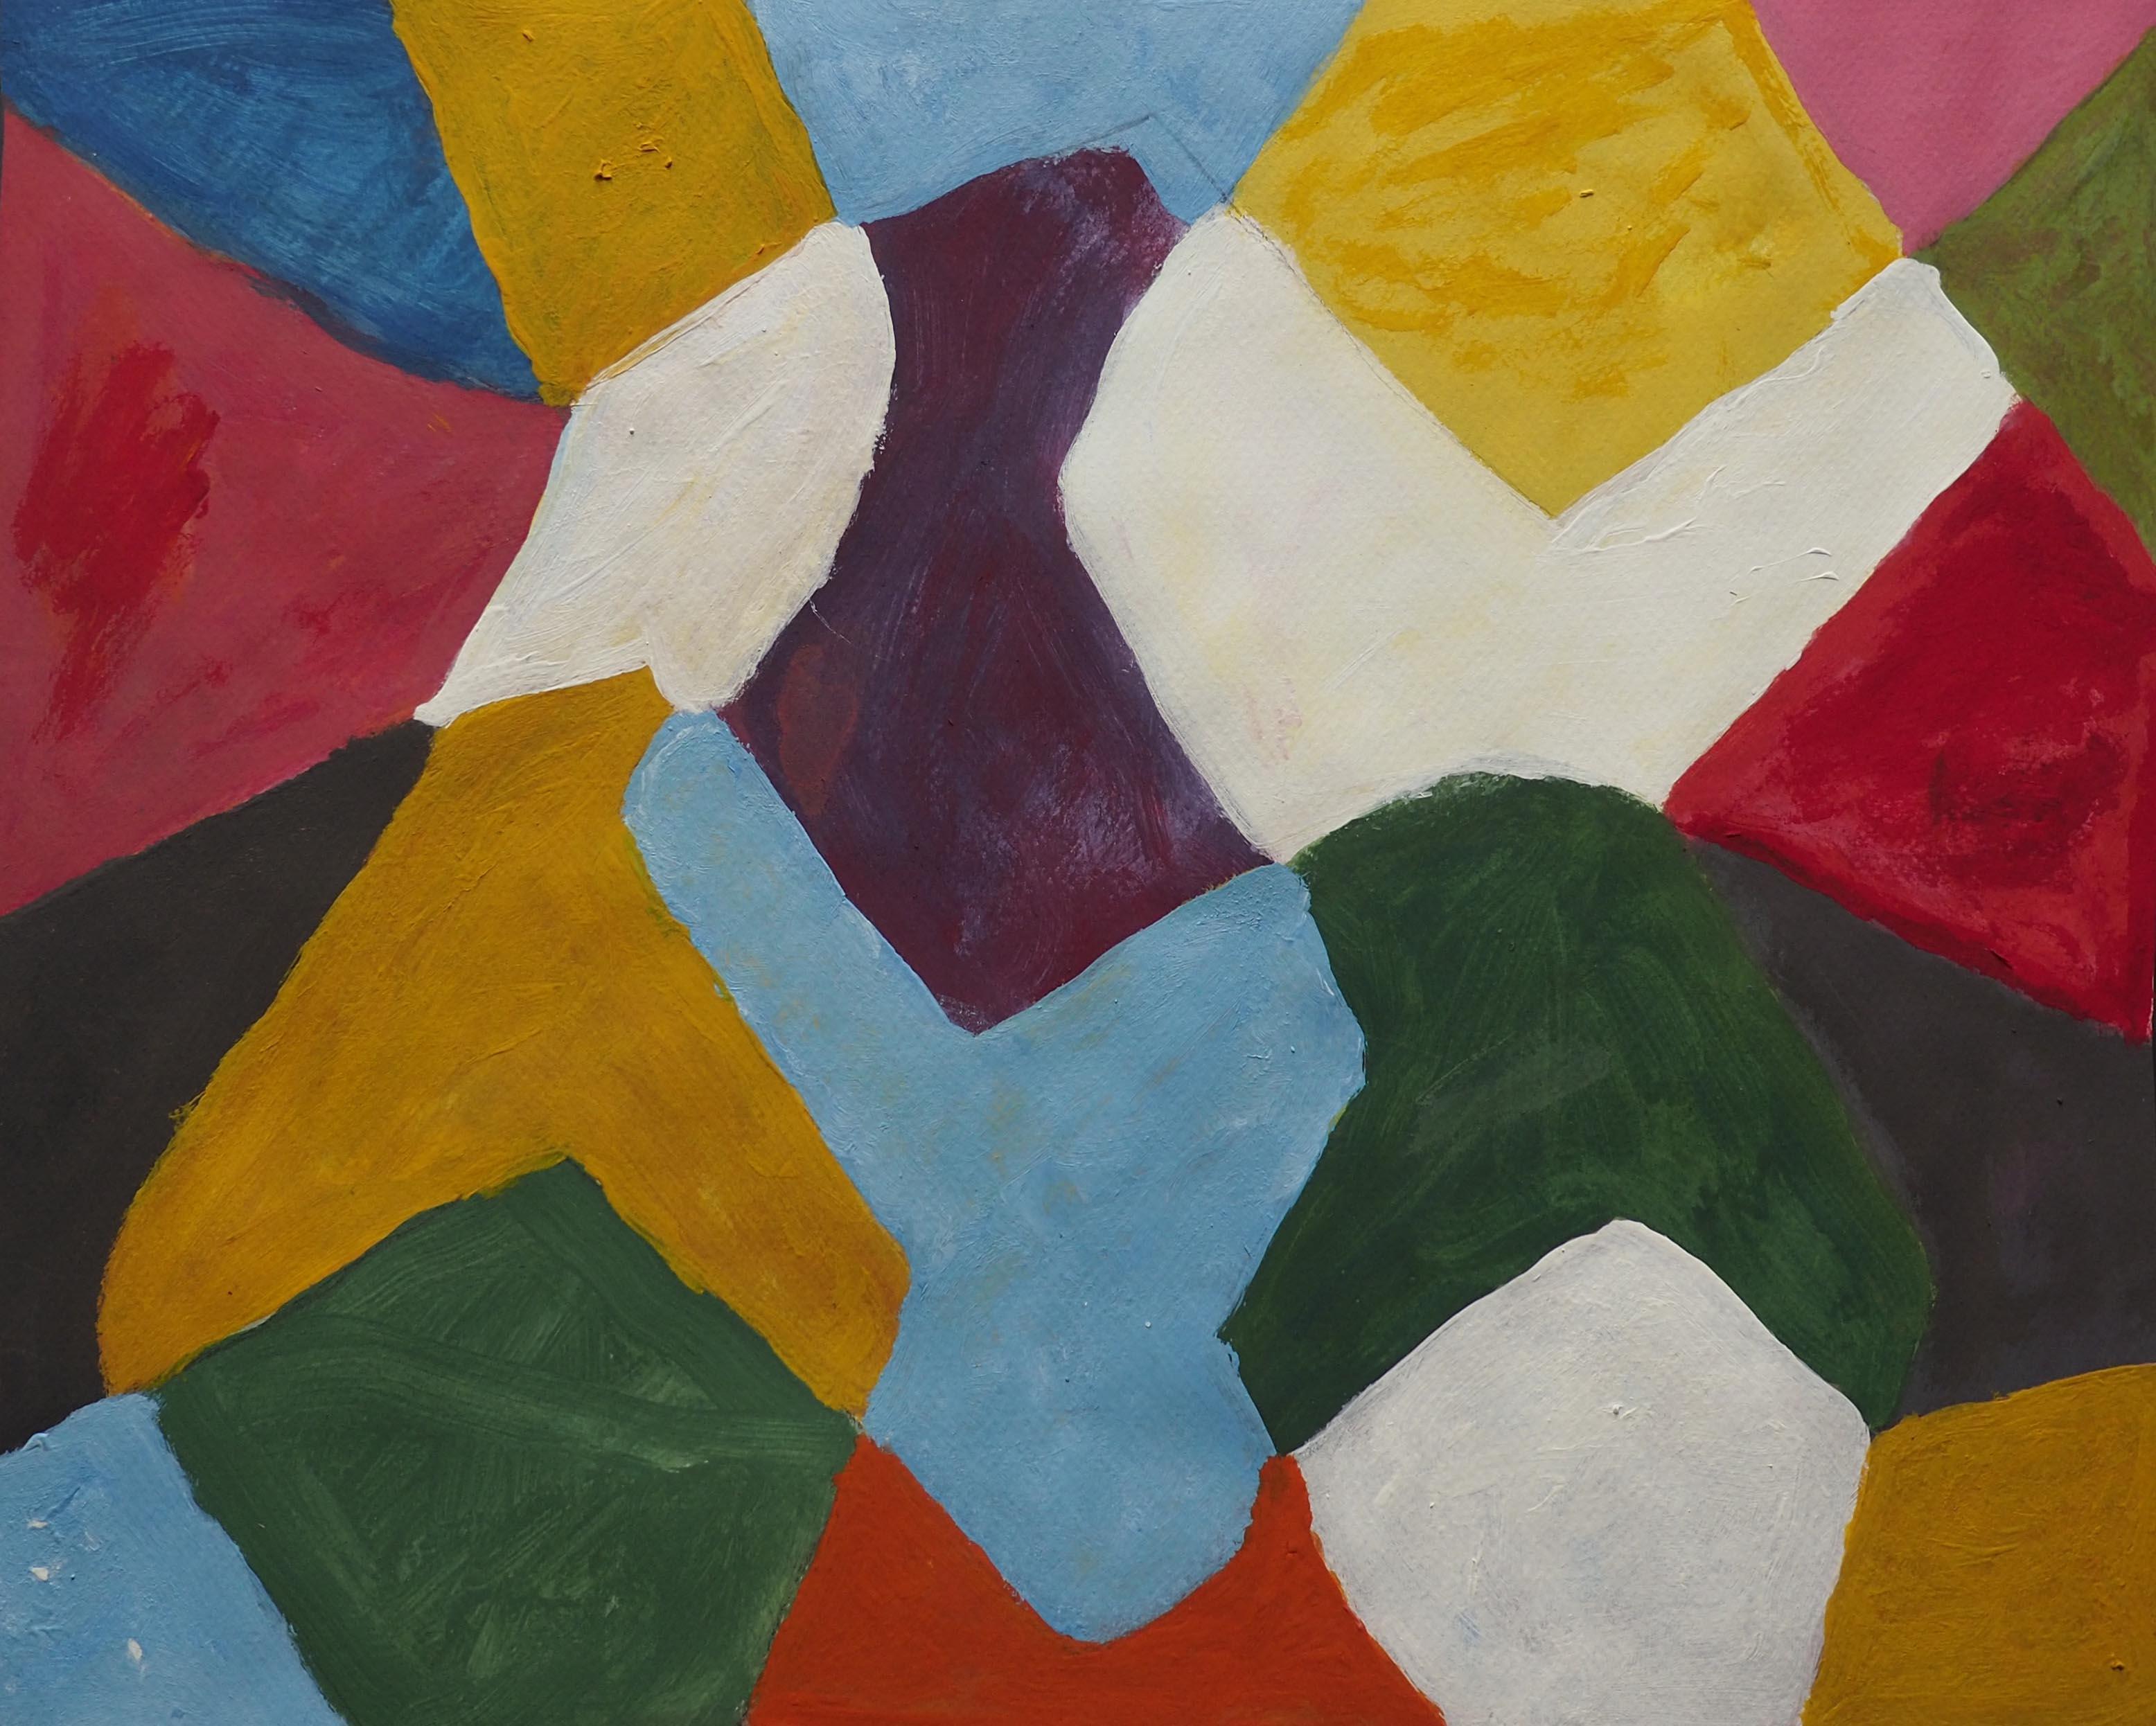 Soua Lama, 31x40